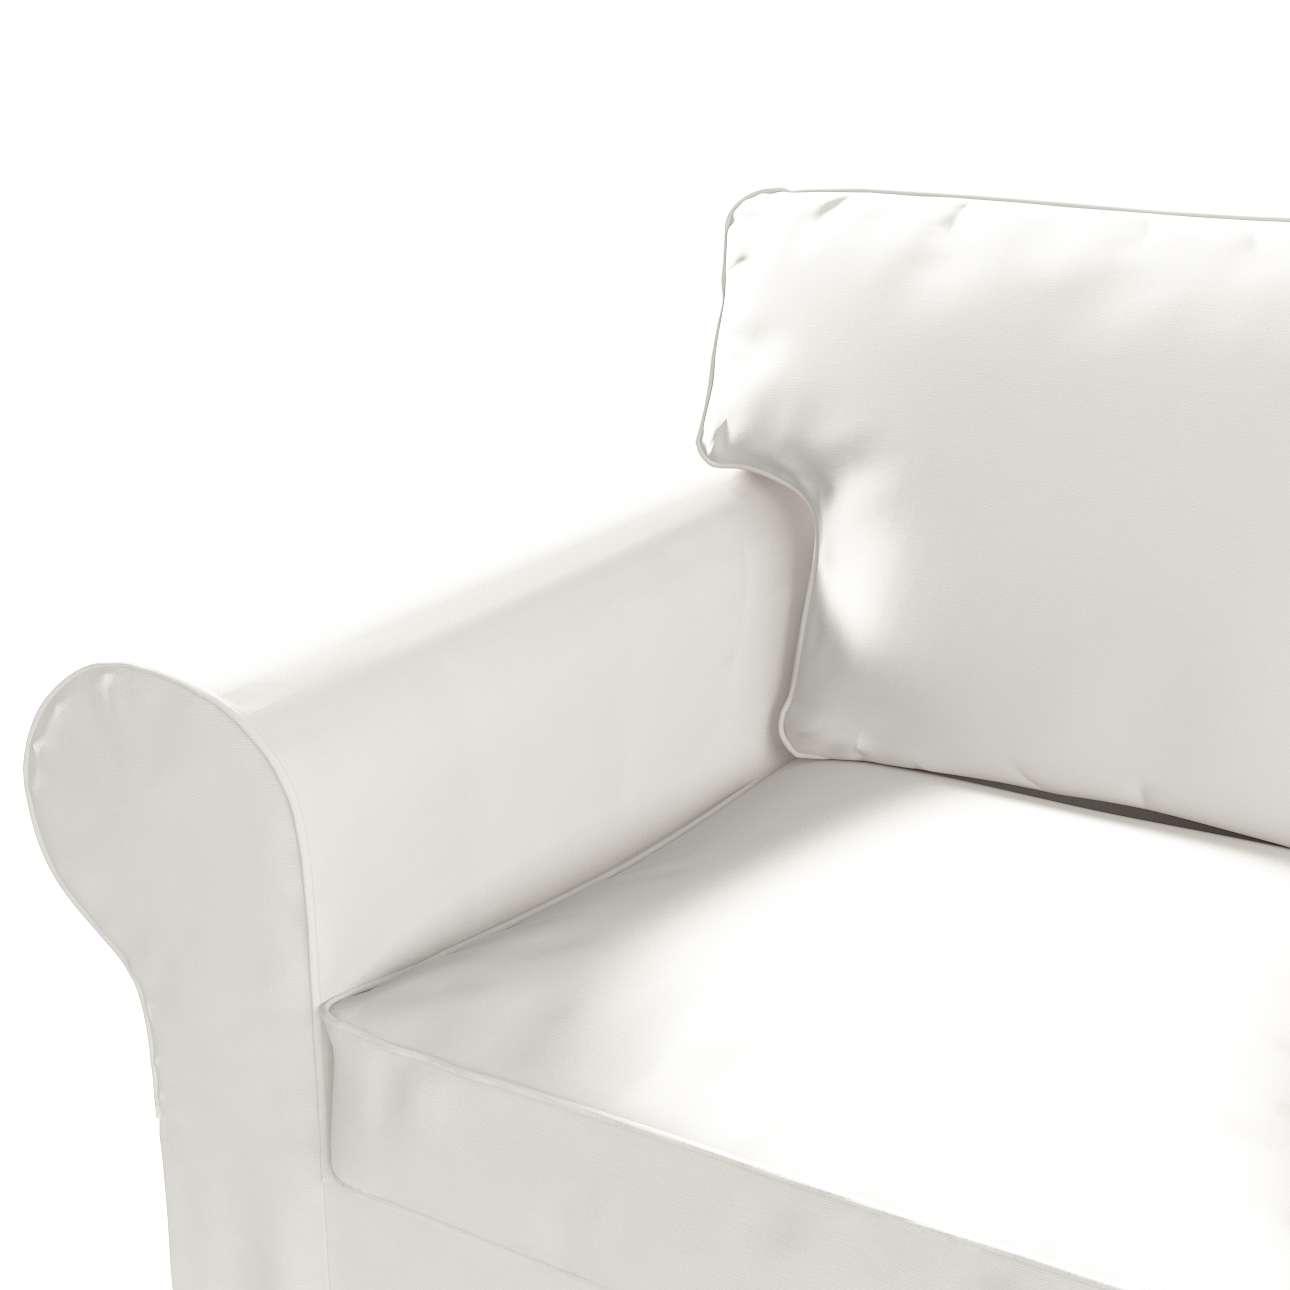 Ektorp 3-Sitzer Schlafsofabezug, ALTES Modell Sofahusse Ektorp 3-Sitzer Schlafsofa von der Kollektion Cotton Panama, Stoff: 702-34